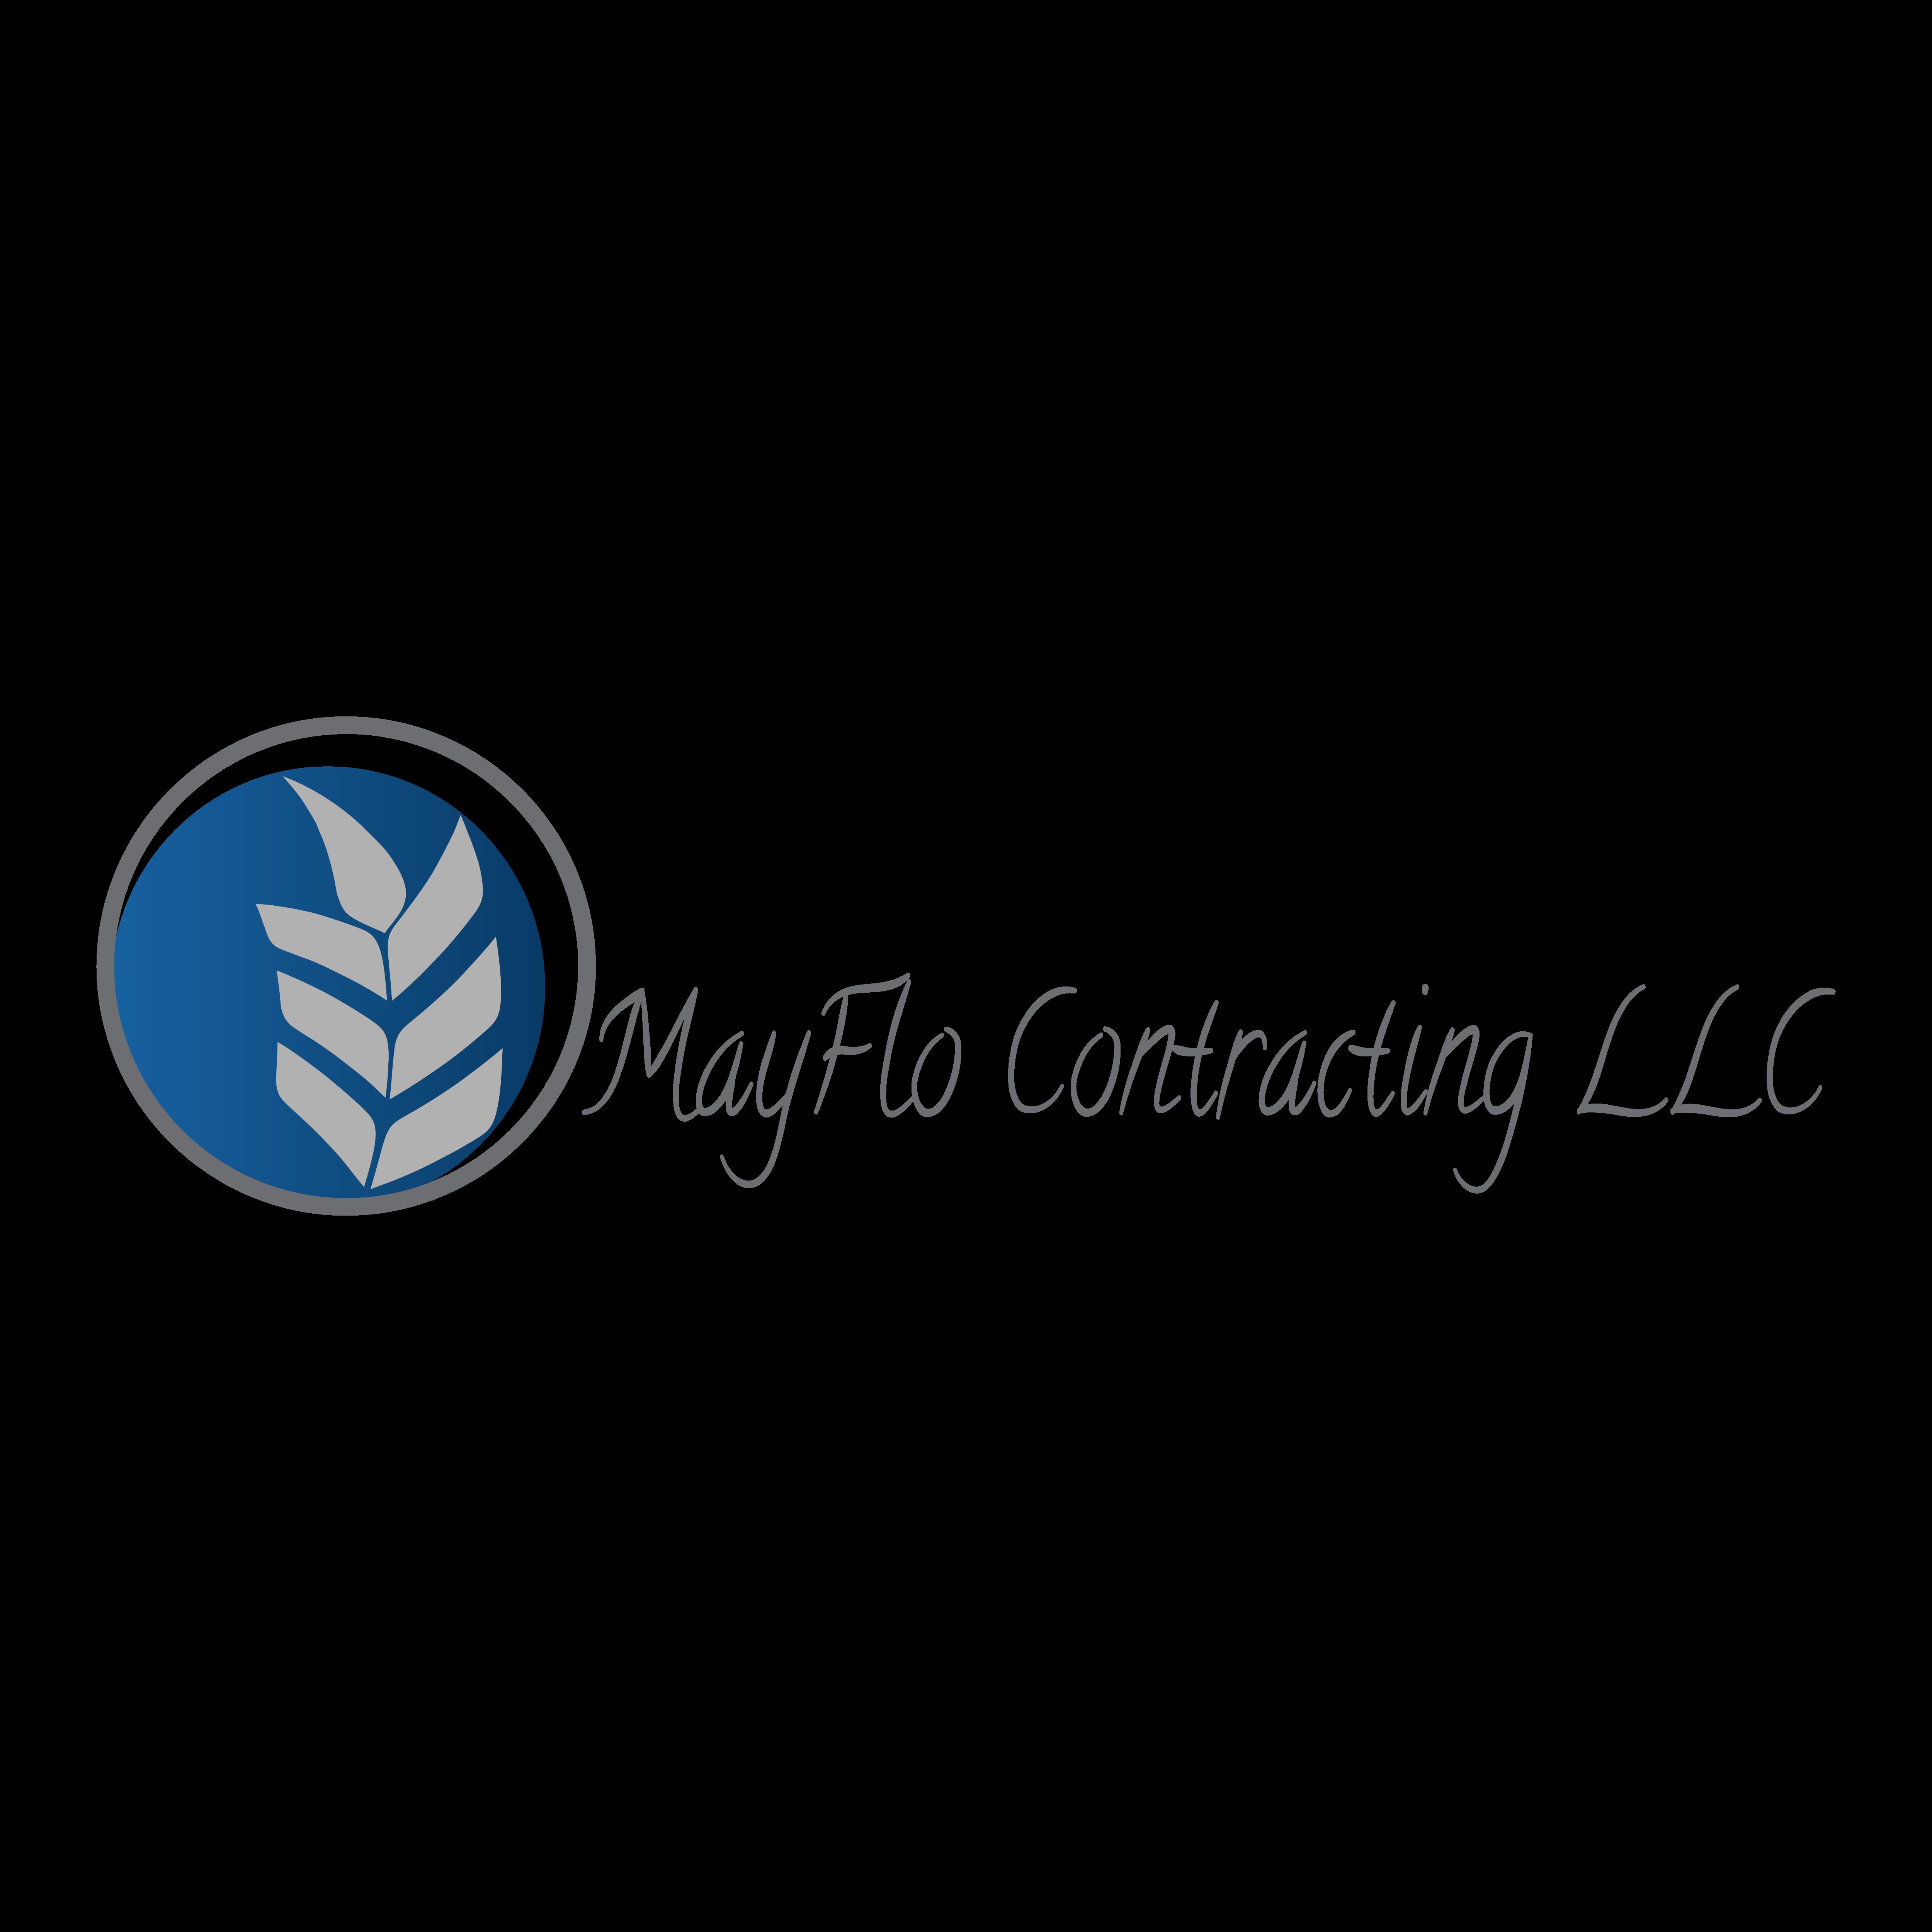 MayFlo Contracting LLC